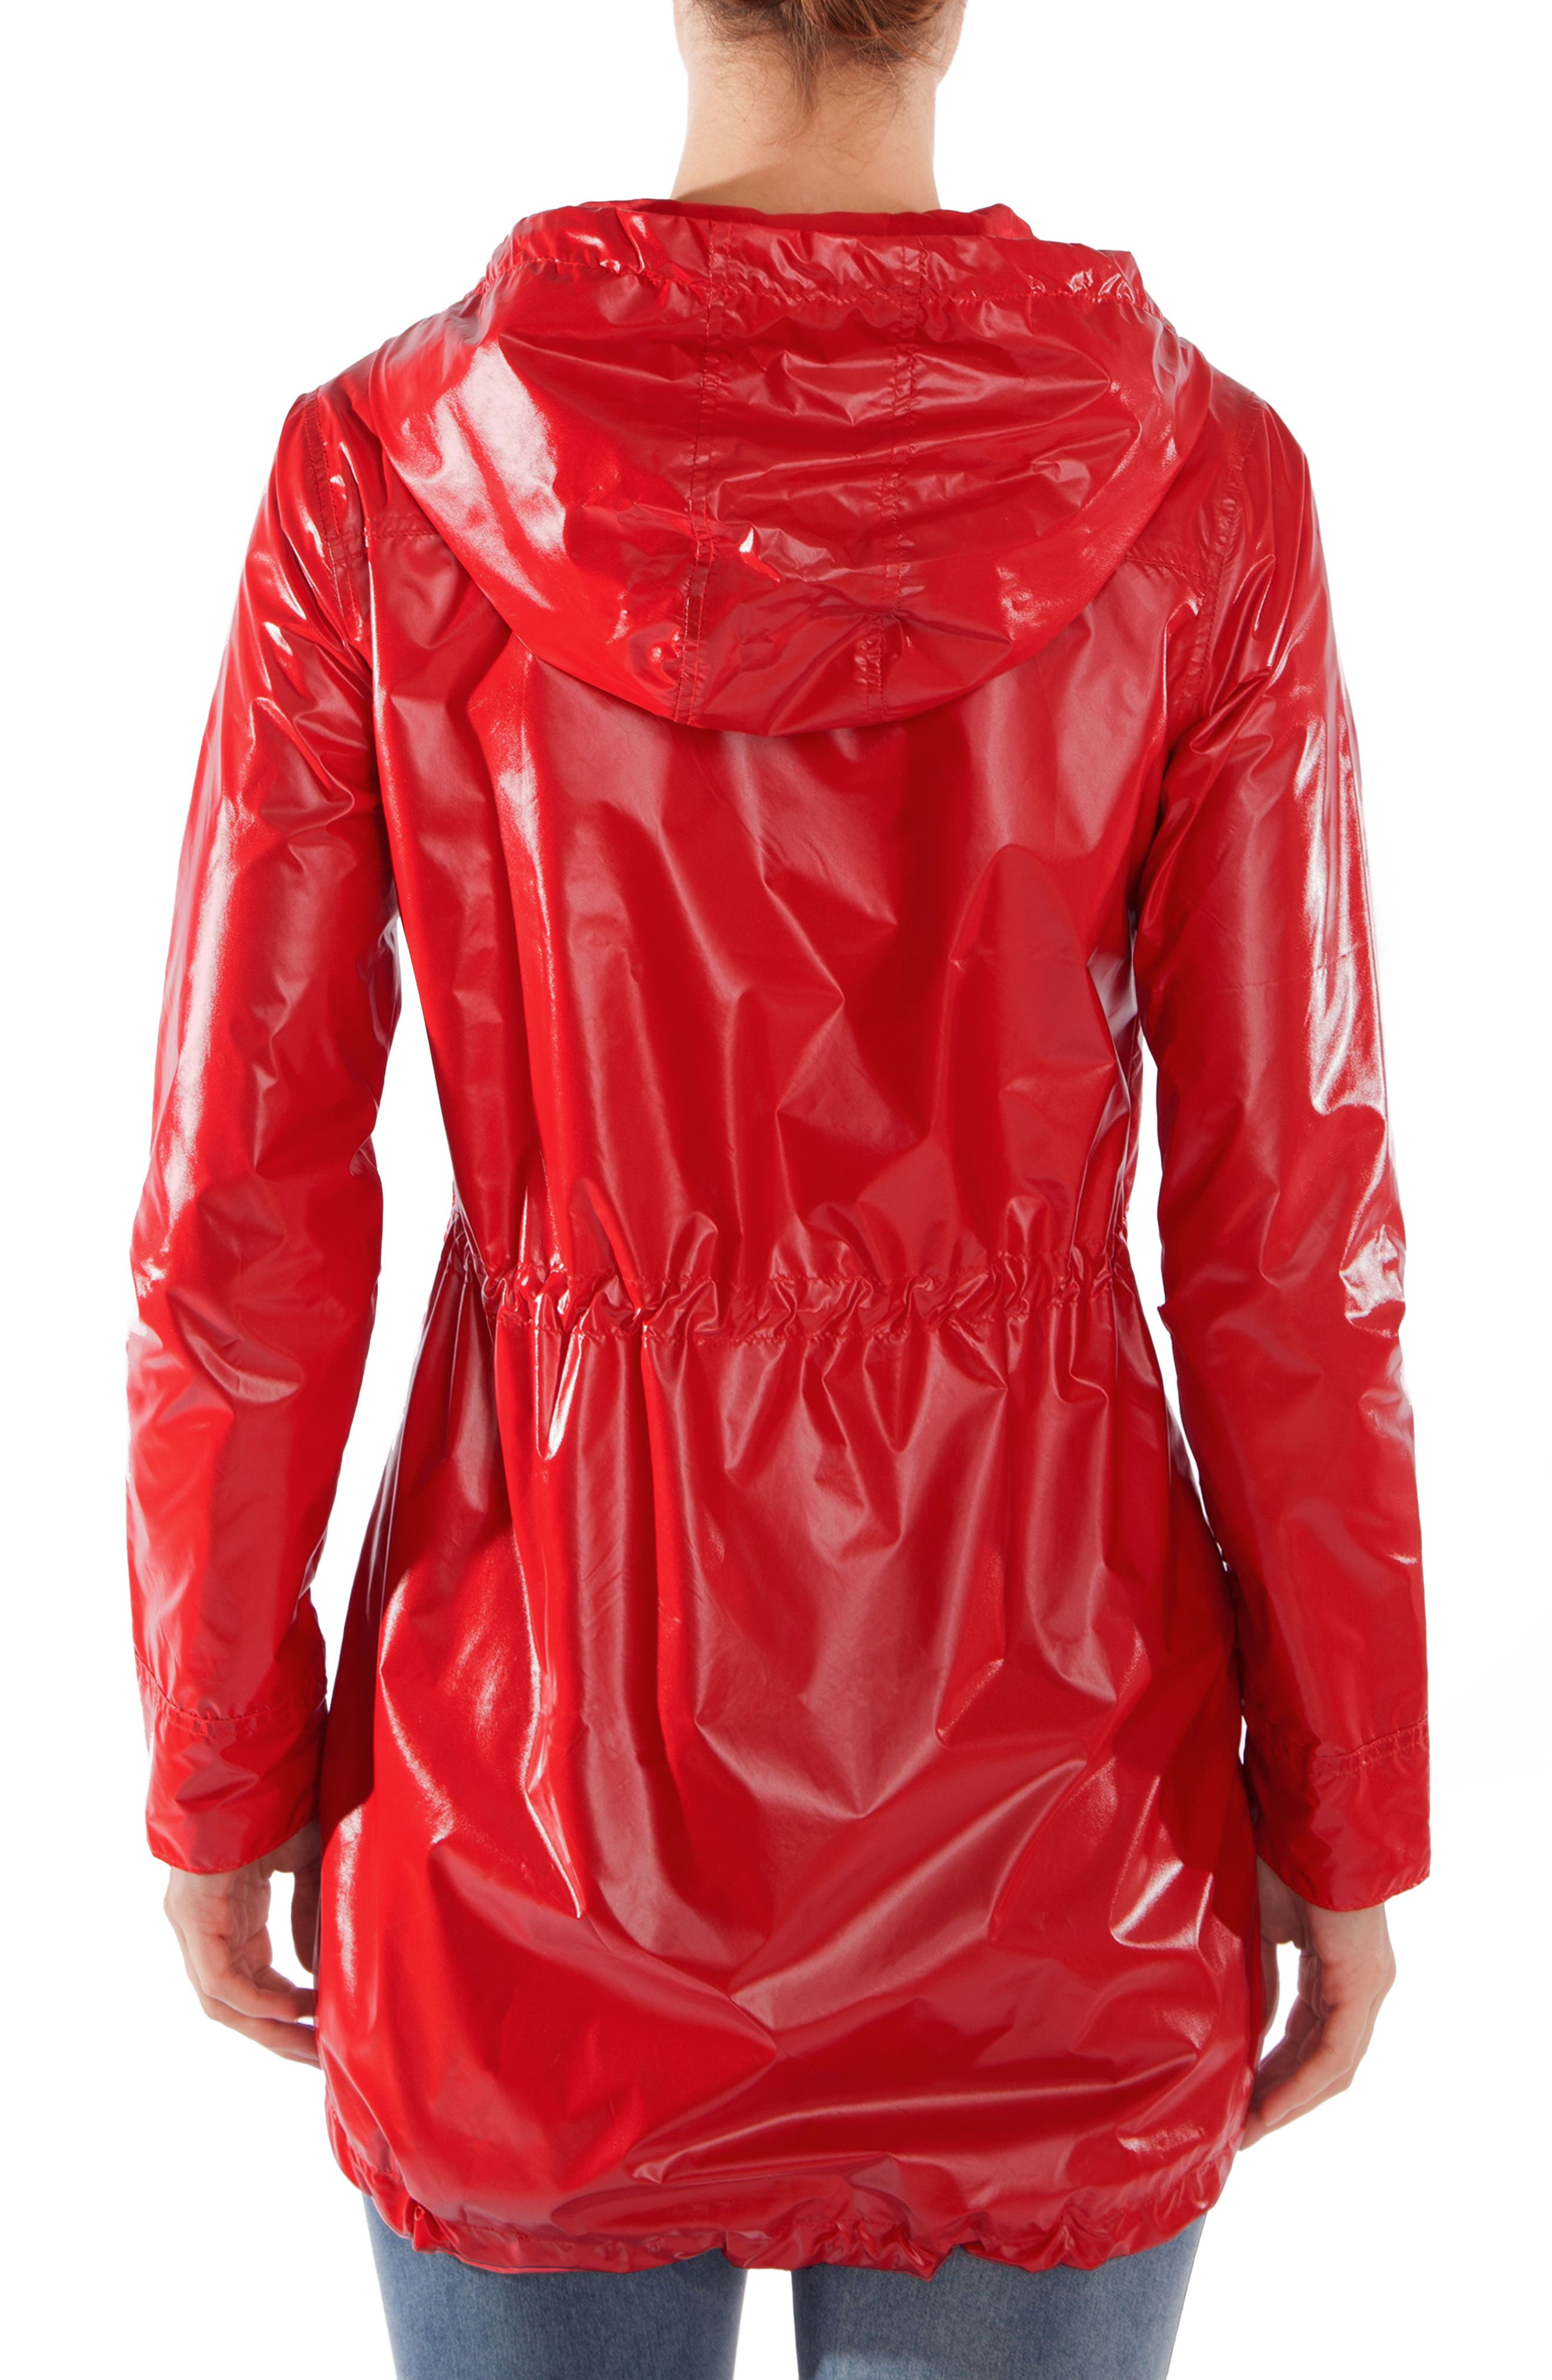 Waterproof Convertible 3-in-1 Maternity Raincoat,                             Alternate thumbnail 4, color,                             BRIGHT NAVY